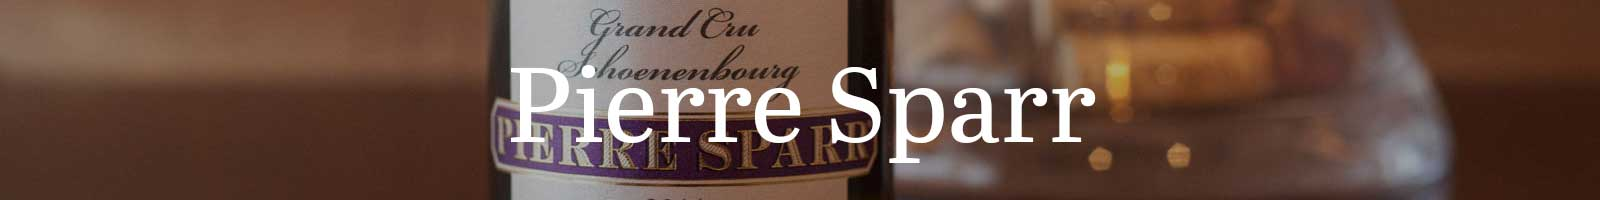 Essential Winemaker of France: Pierre Sparr